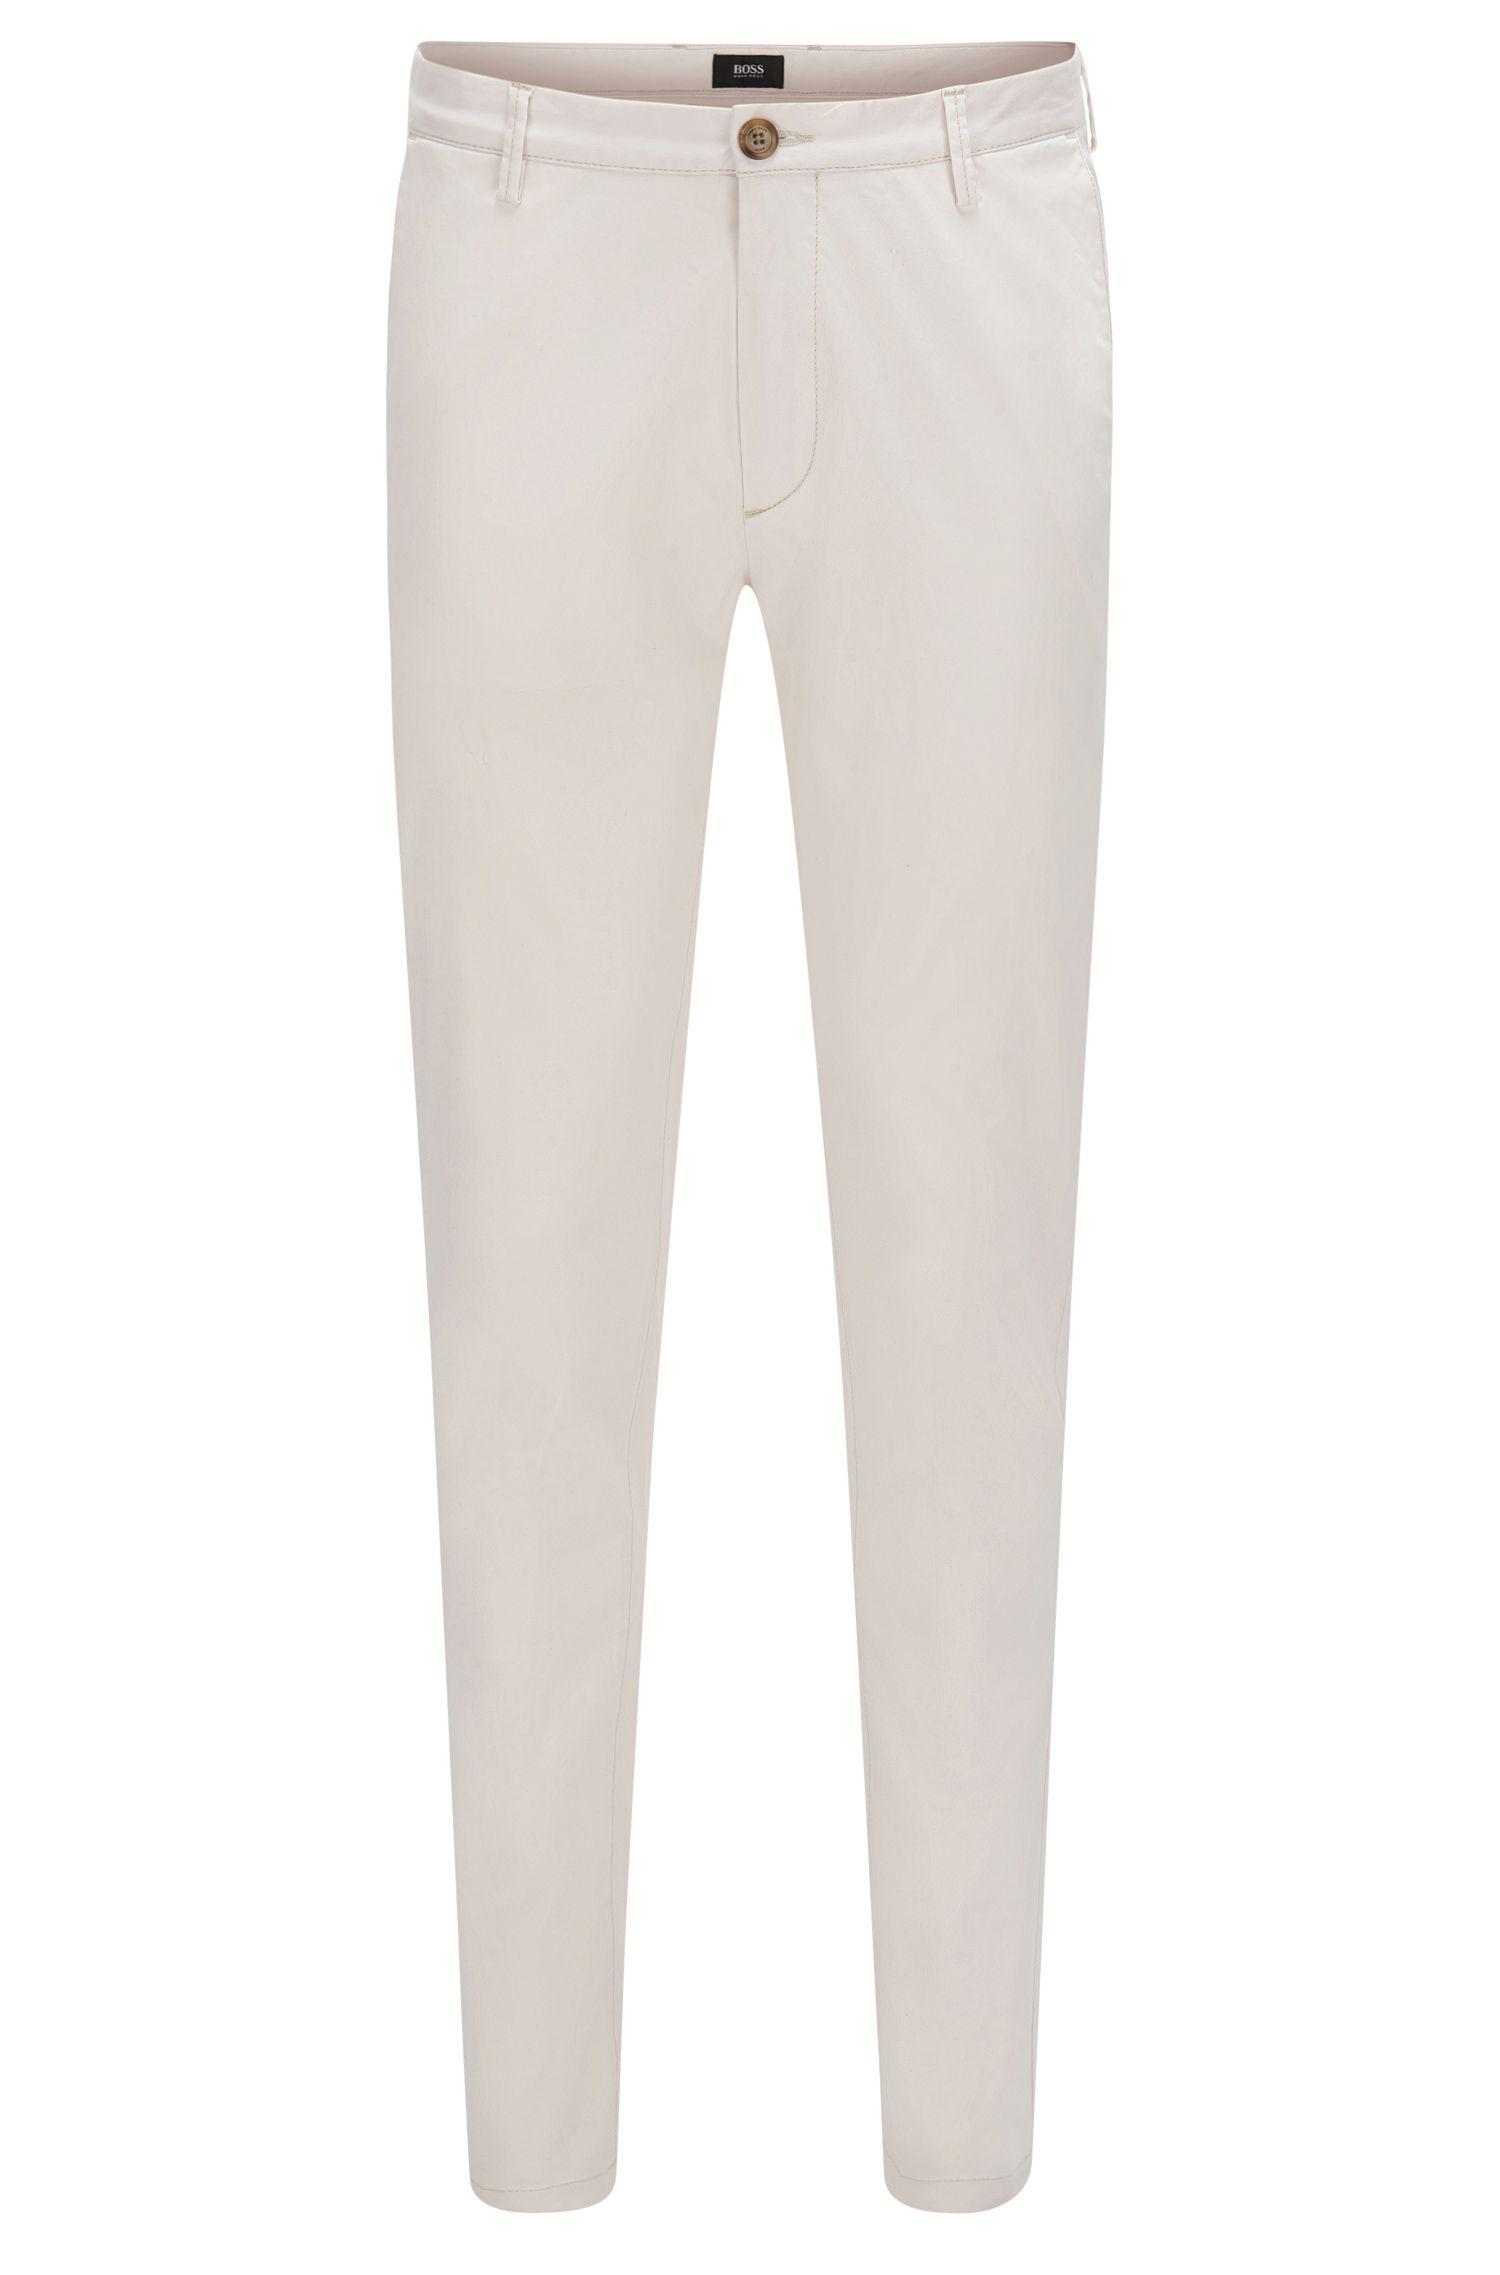 Italian Stretch Cotton Pant, Slim Fit | Rice W